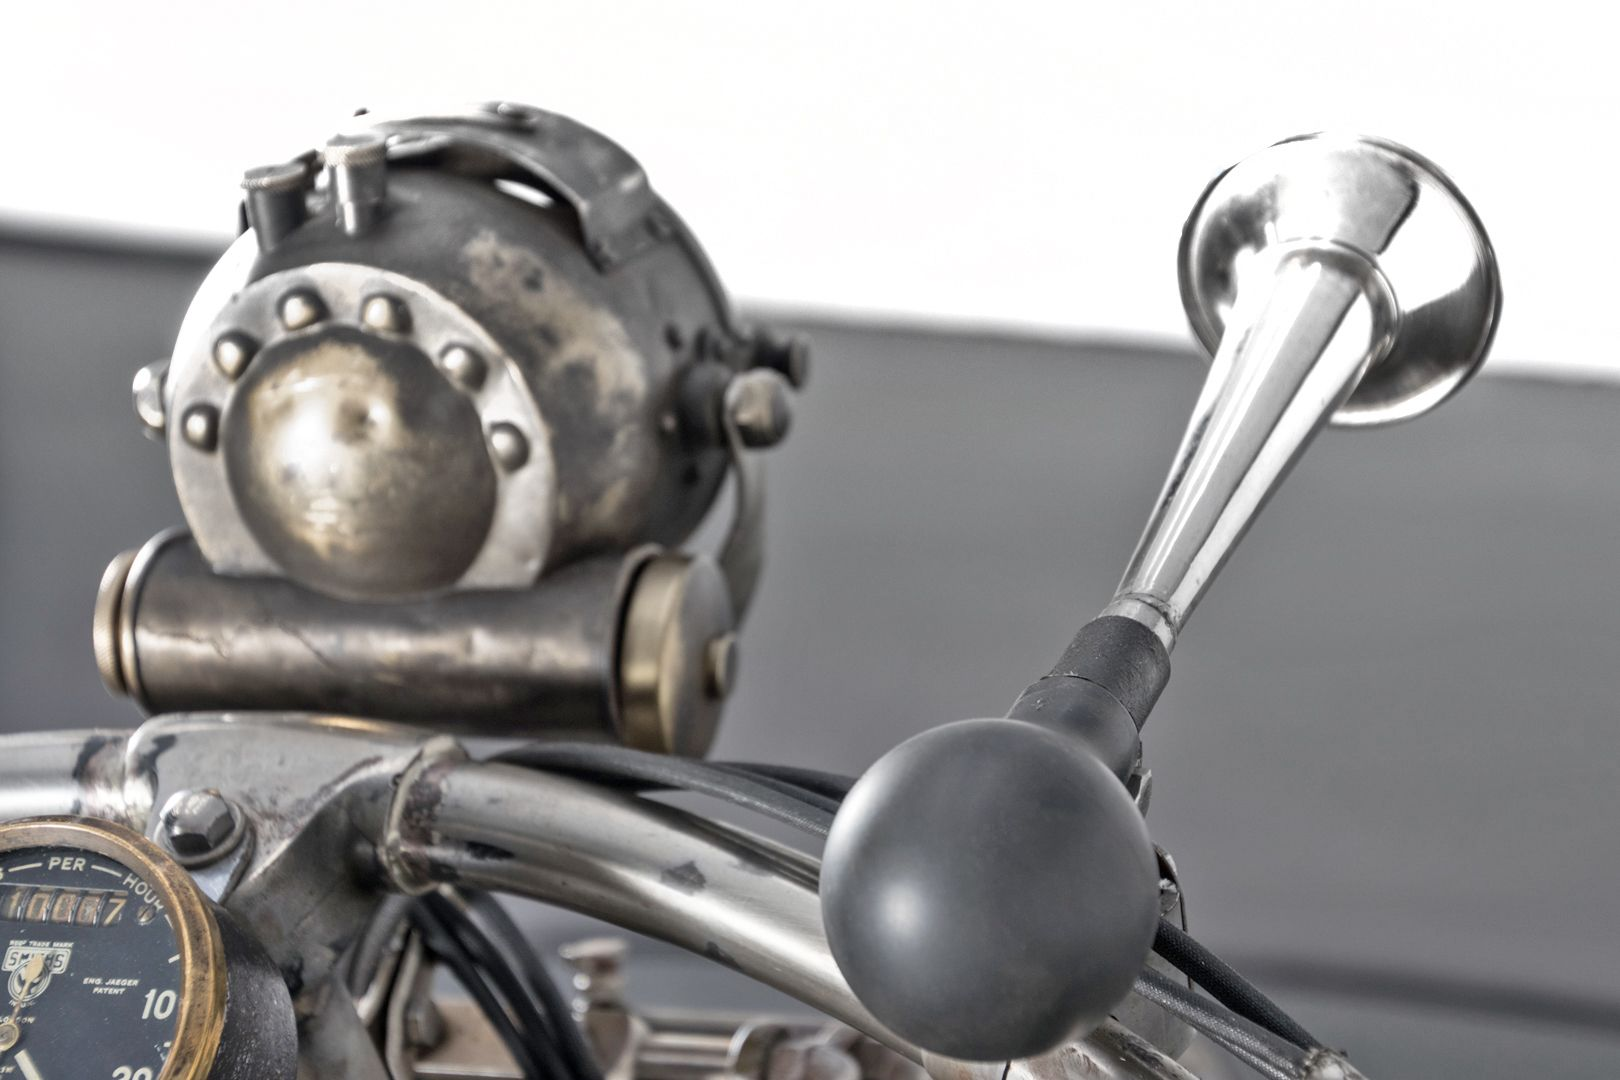 1924 Moto Guzzi 500 Normale 36472